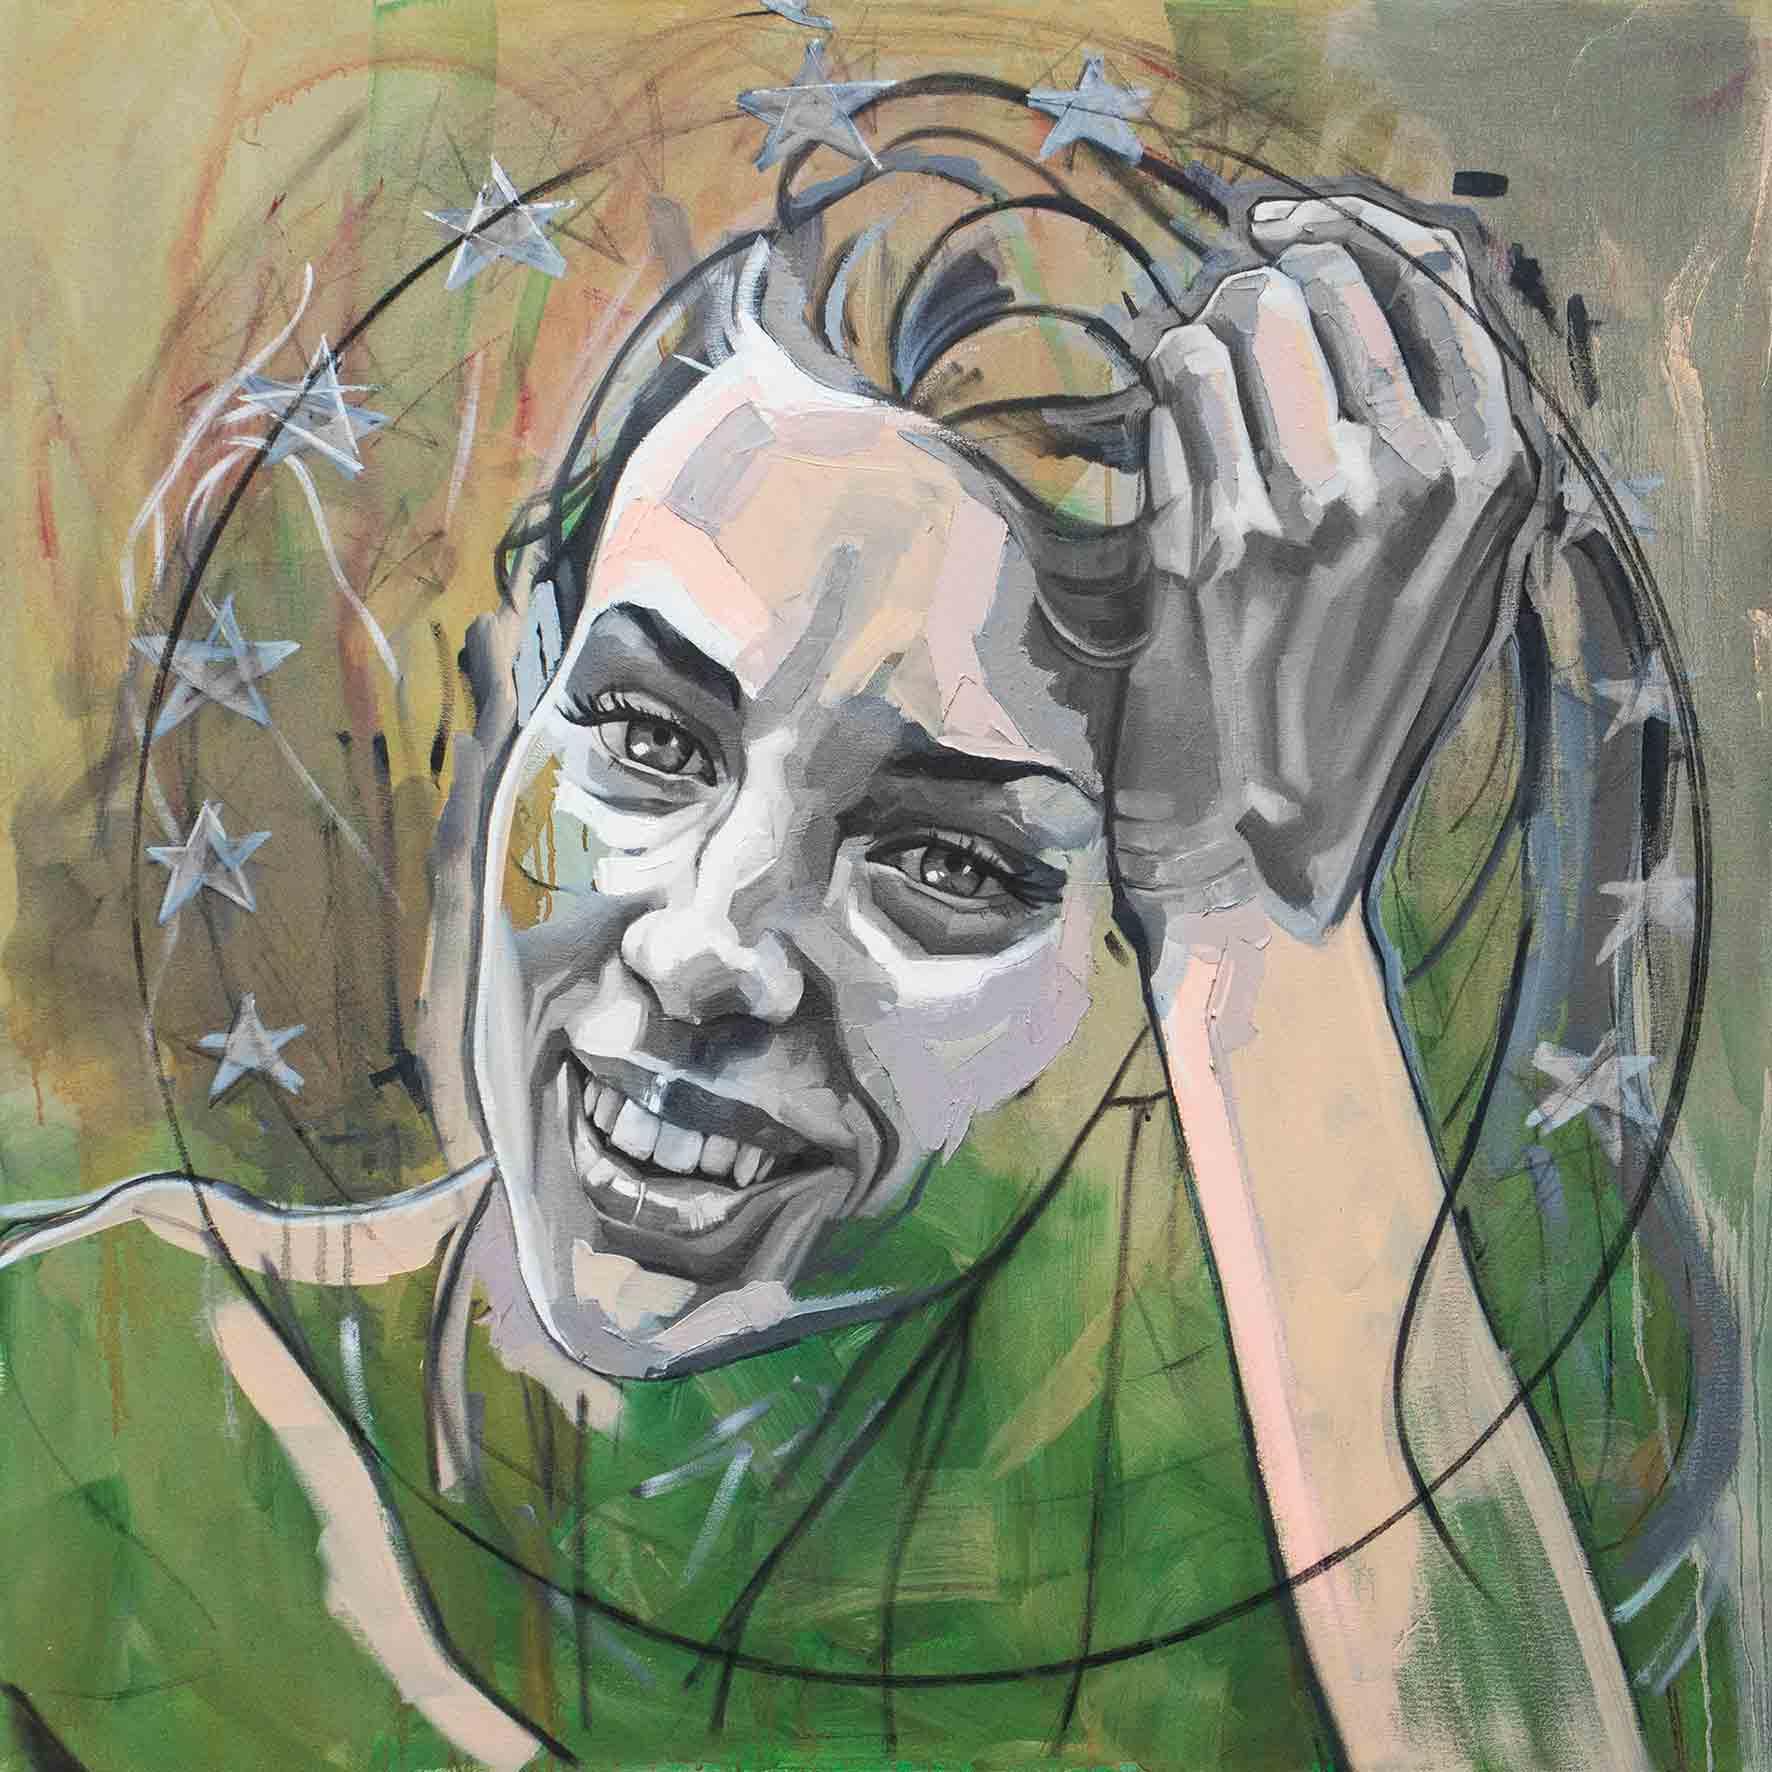 Natalya & the stars, Oil & Acrylic on Canvas 48×48 Inches